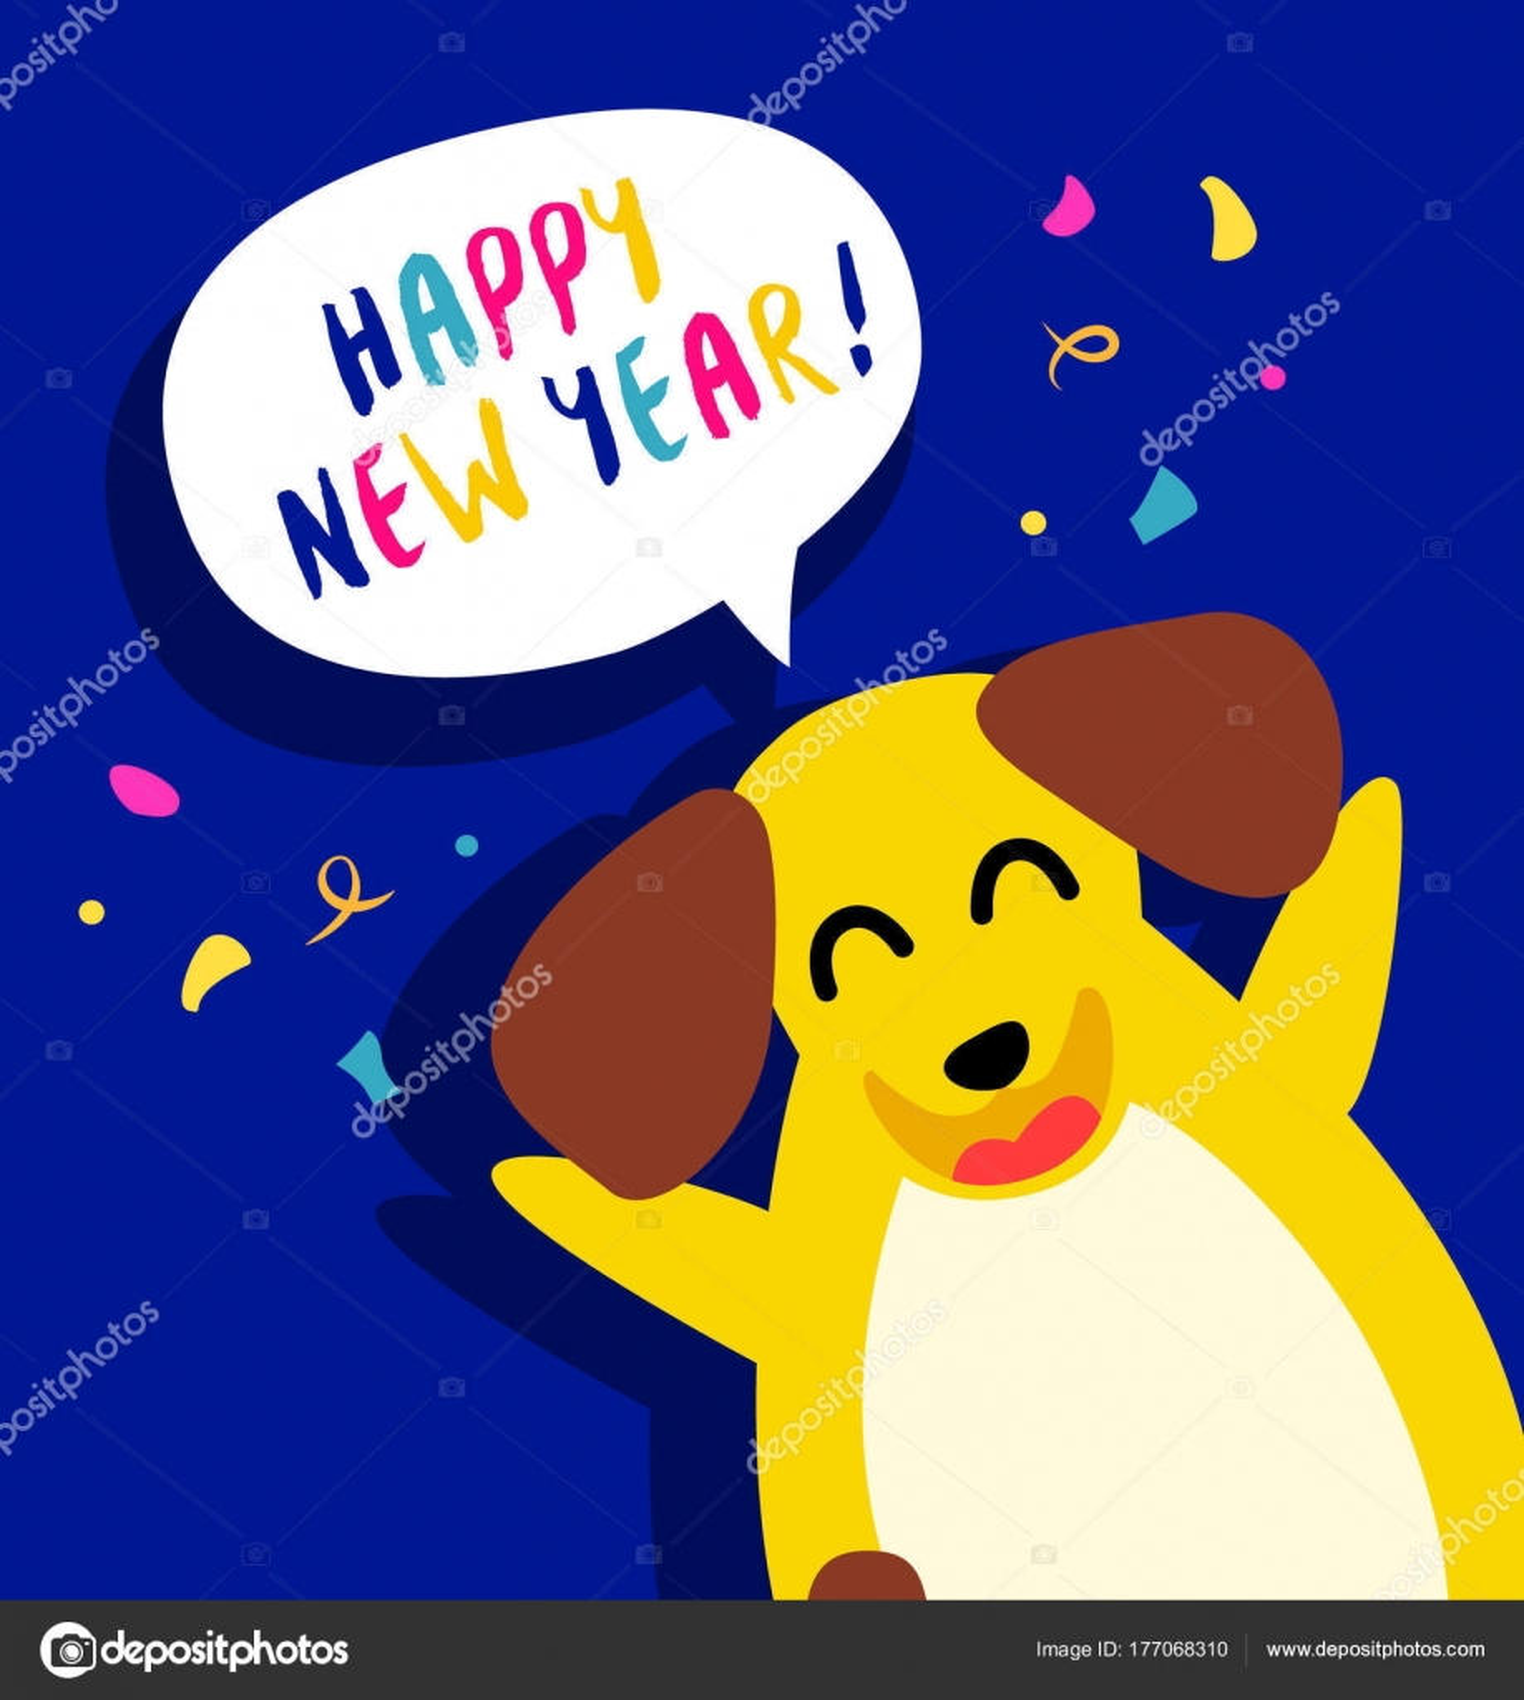 Happy New Year Card Fun Yellow Dog Confetti Blue Background Stock